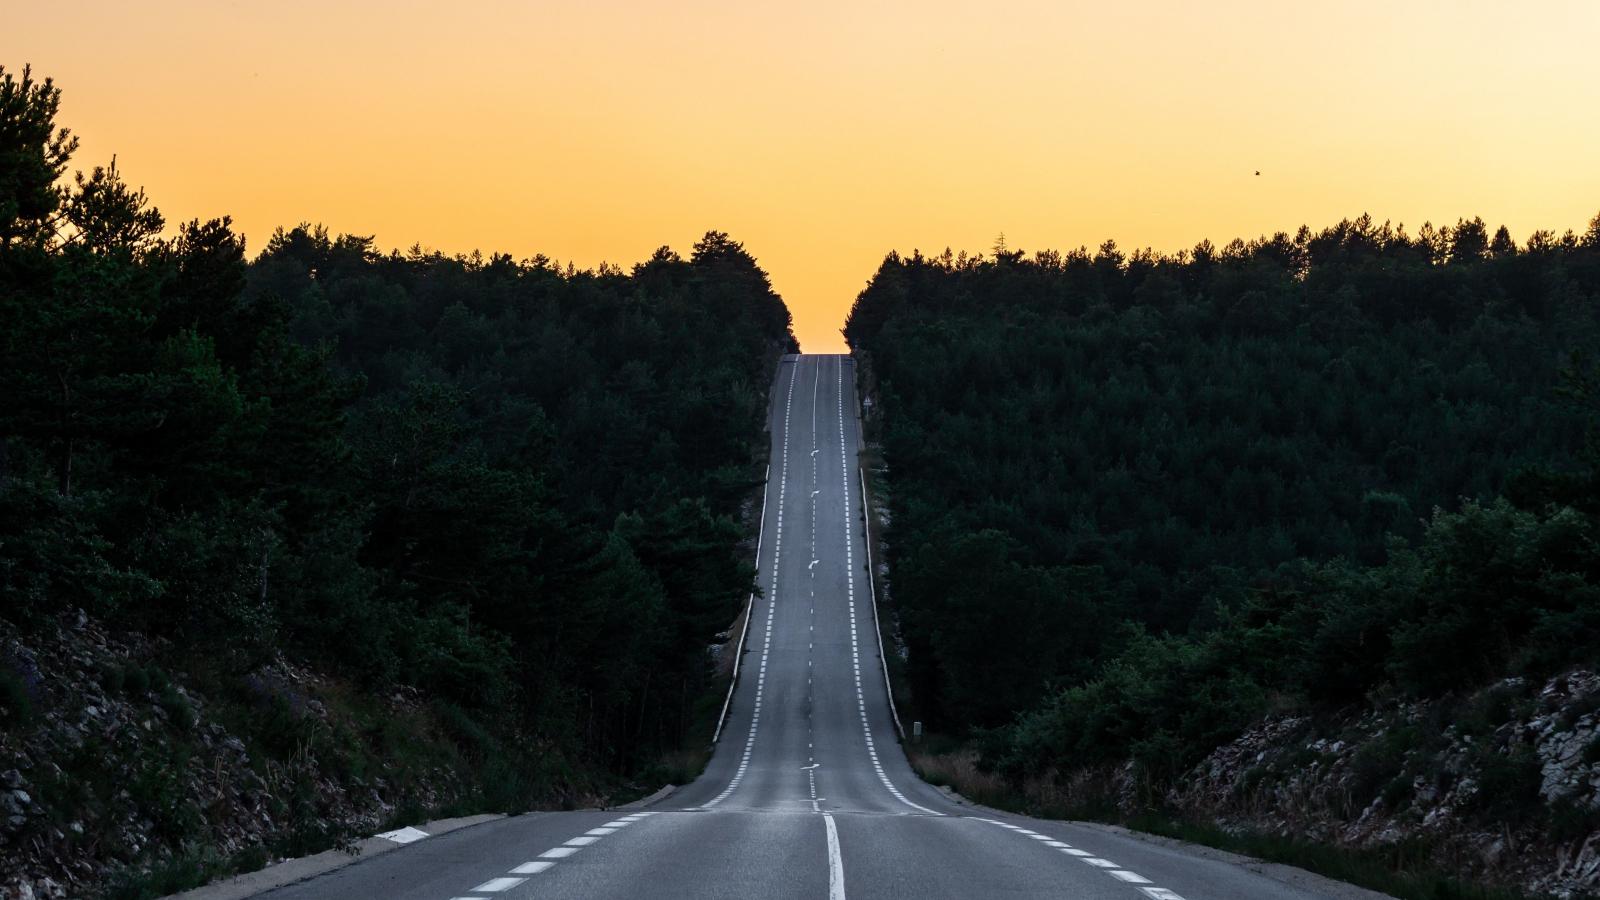 Download 1600x900 wallpaper road journey sunset france widescreen 16 9 widescreen 1600x900 - Wallpapers 1600x900 ...